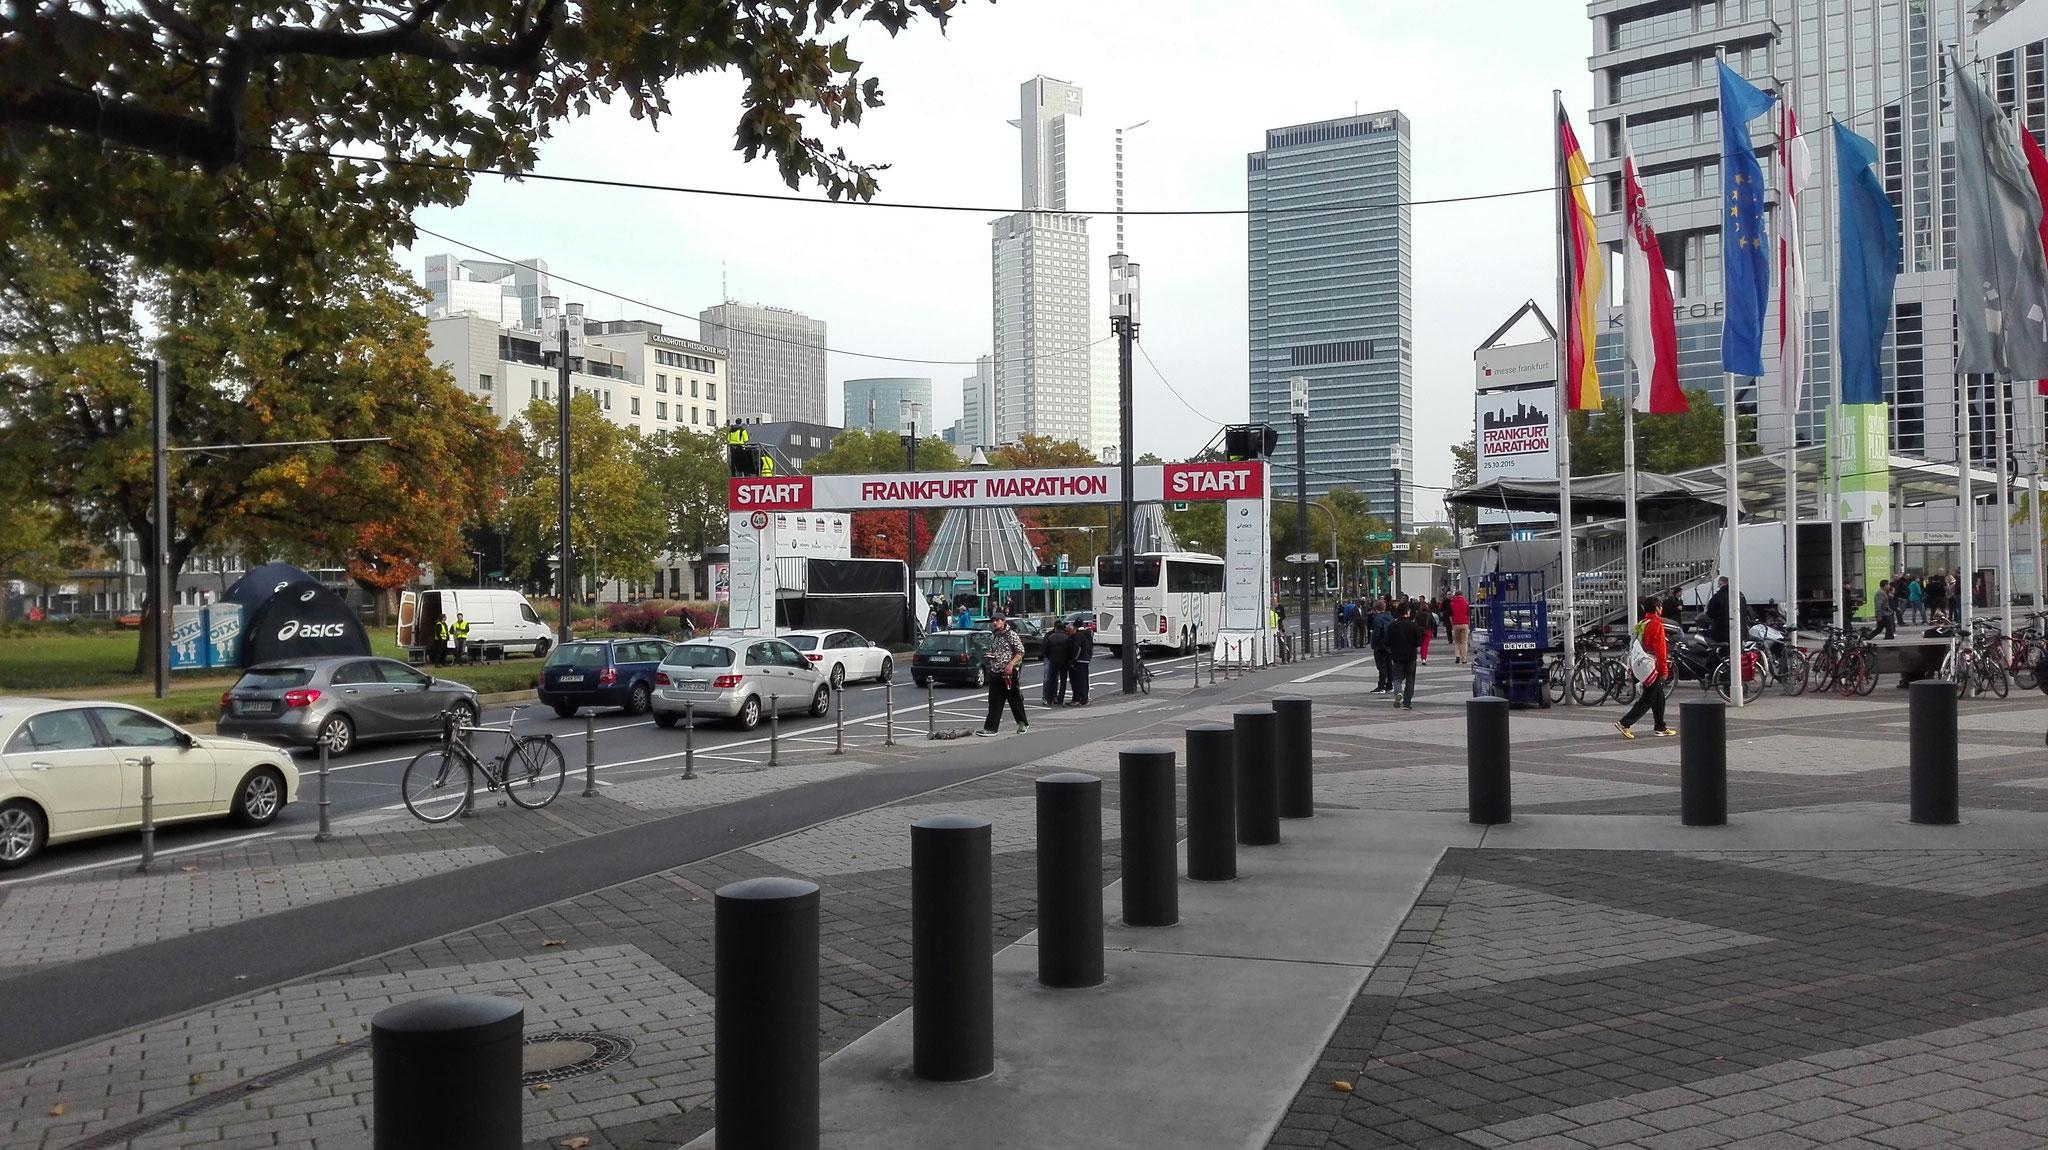 Frankfurt Marathon-Start